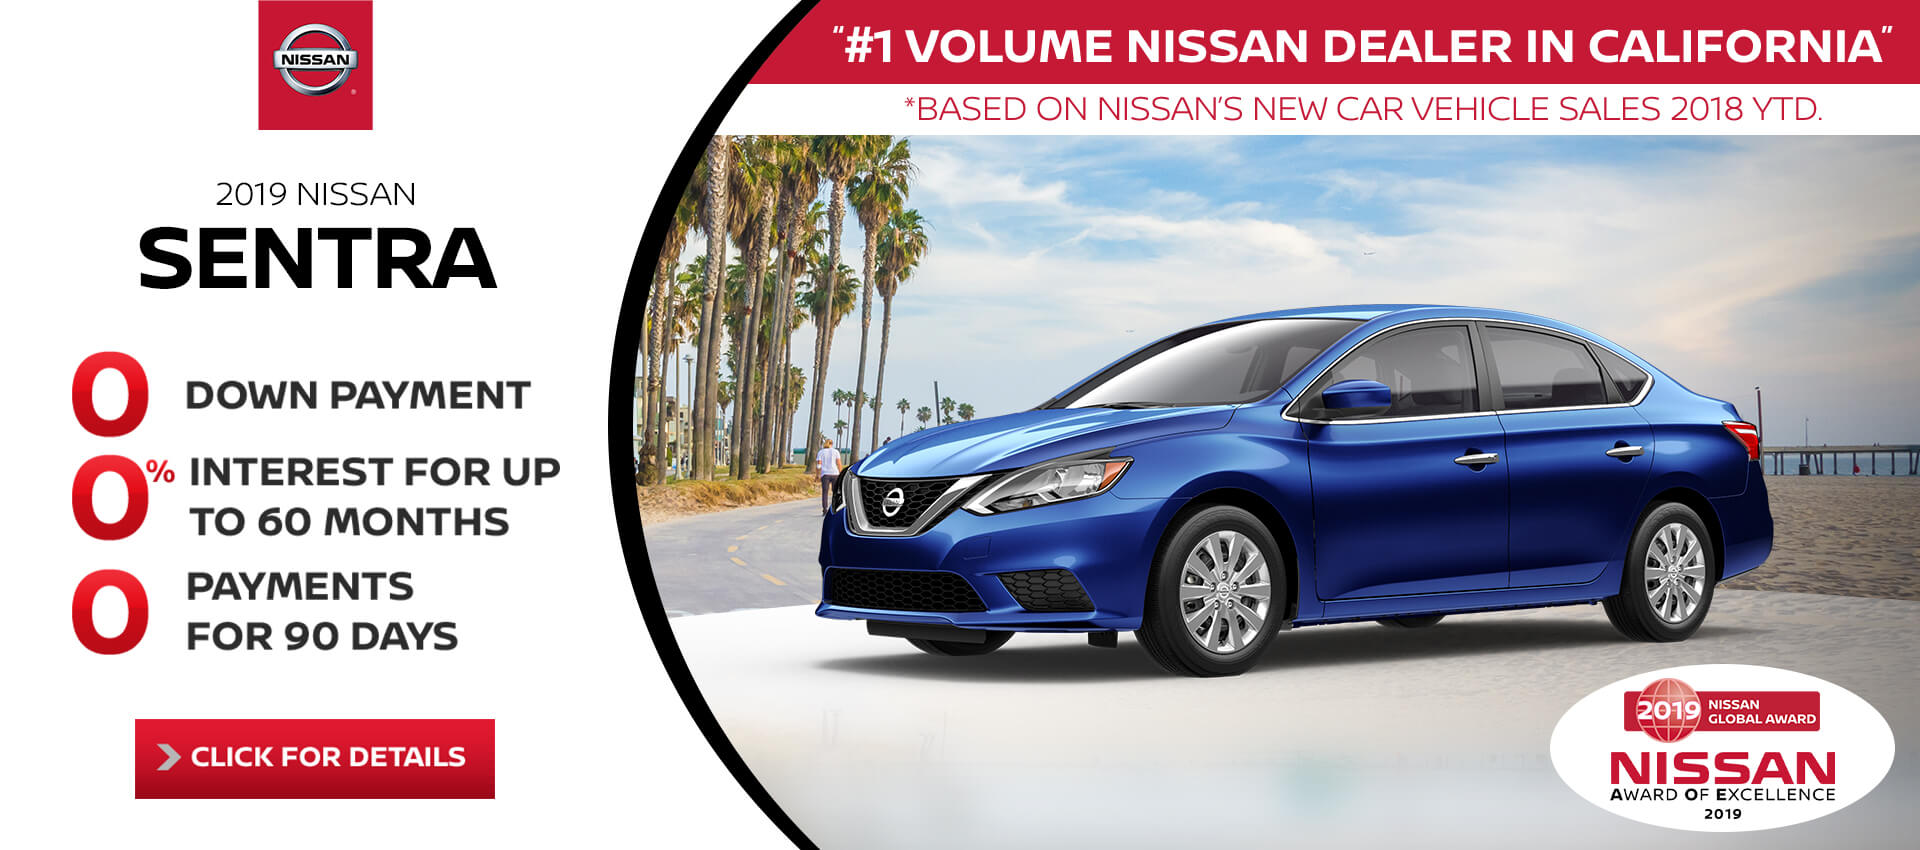 Nissan Dealership Los Angeles >> Downey Nissan California S 1 Volume Nissan Dealer